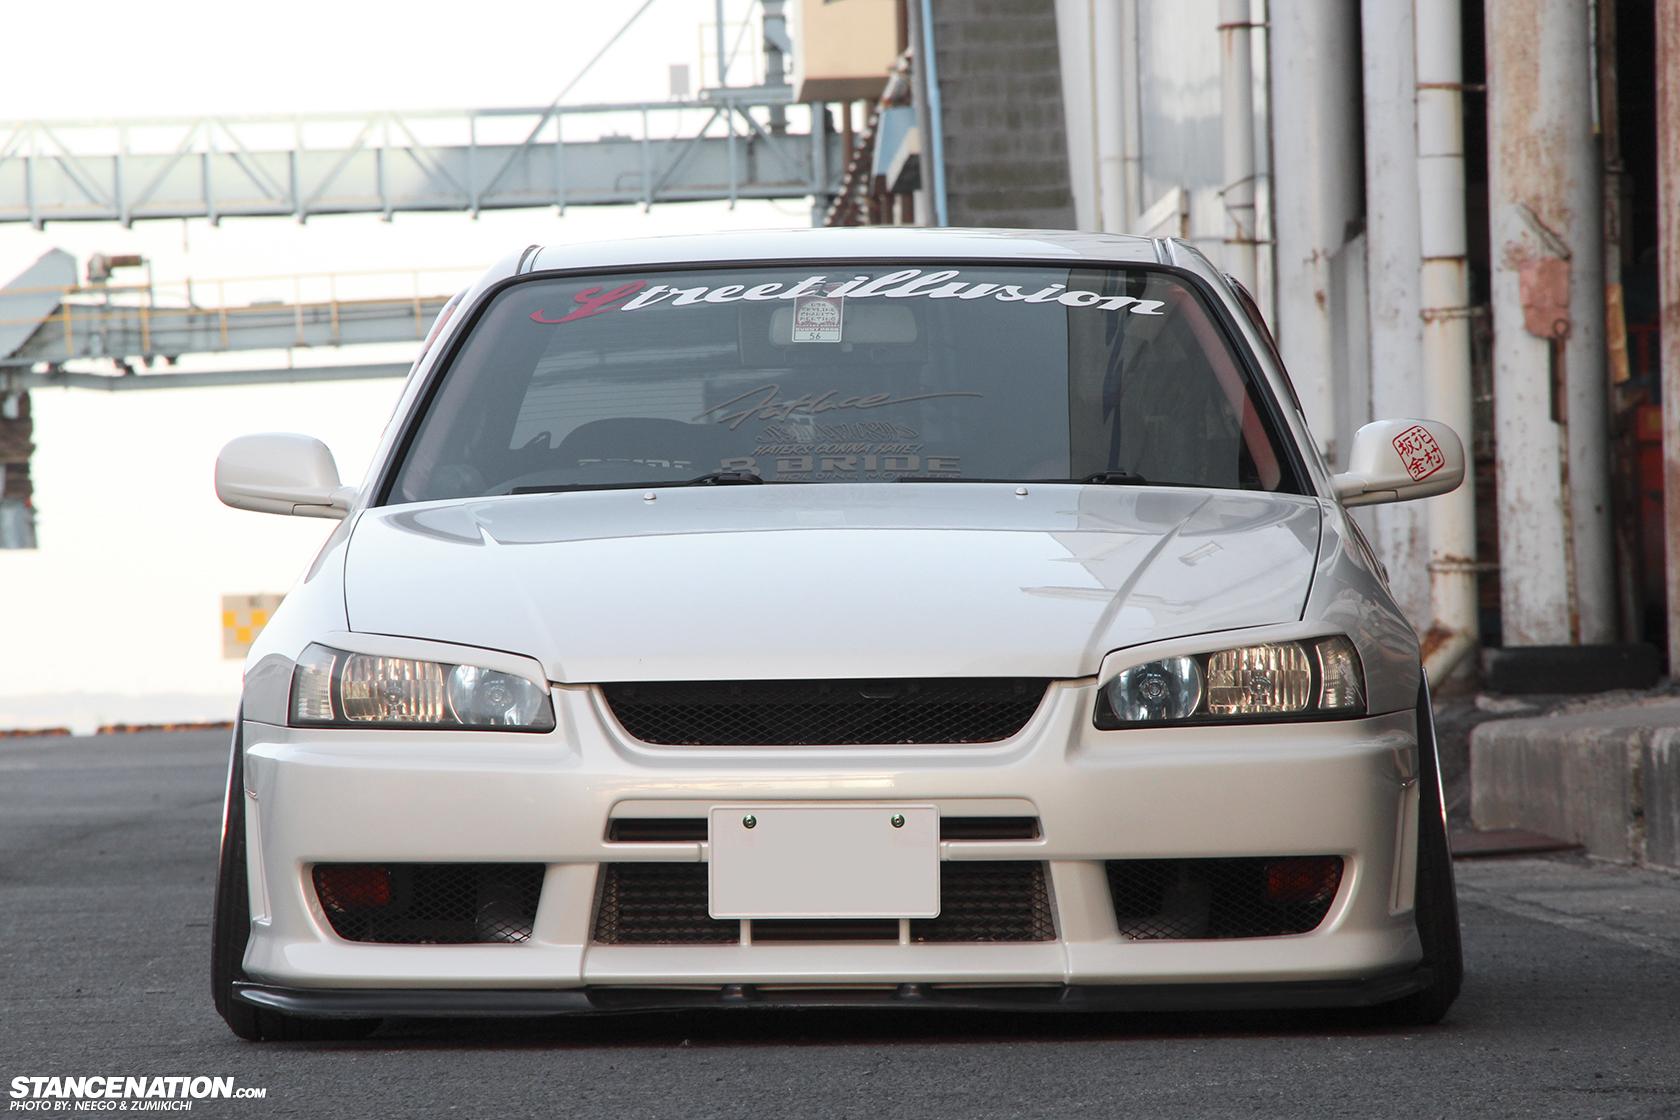 The Forgotten One Kazuyuki S Nissan Skyline Stancenation Form Function